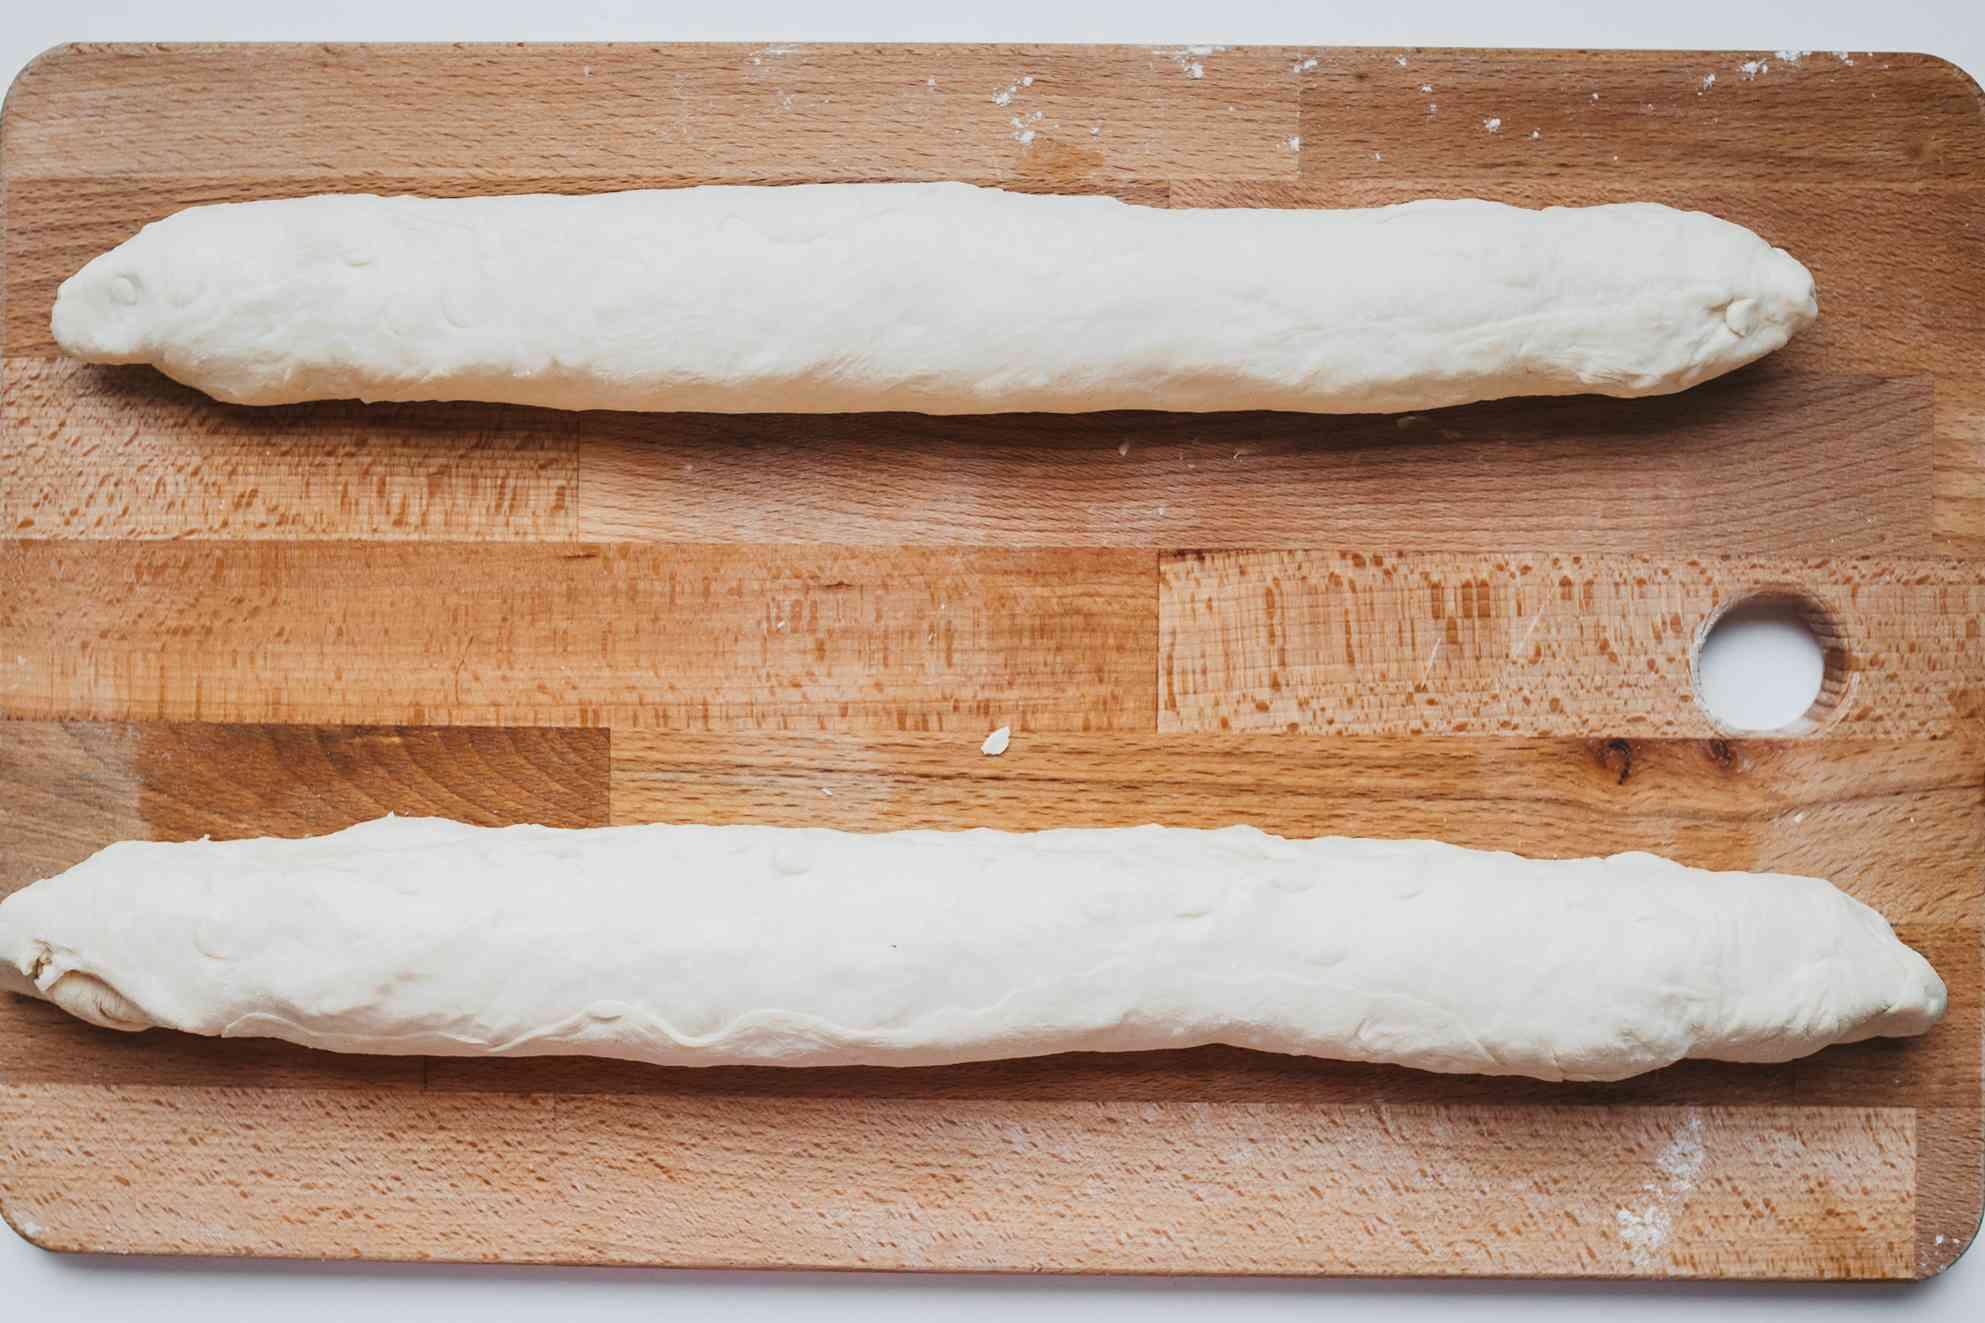 Tightly roll dough